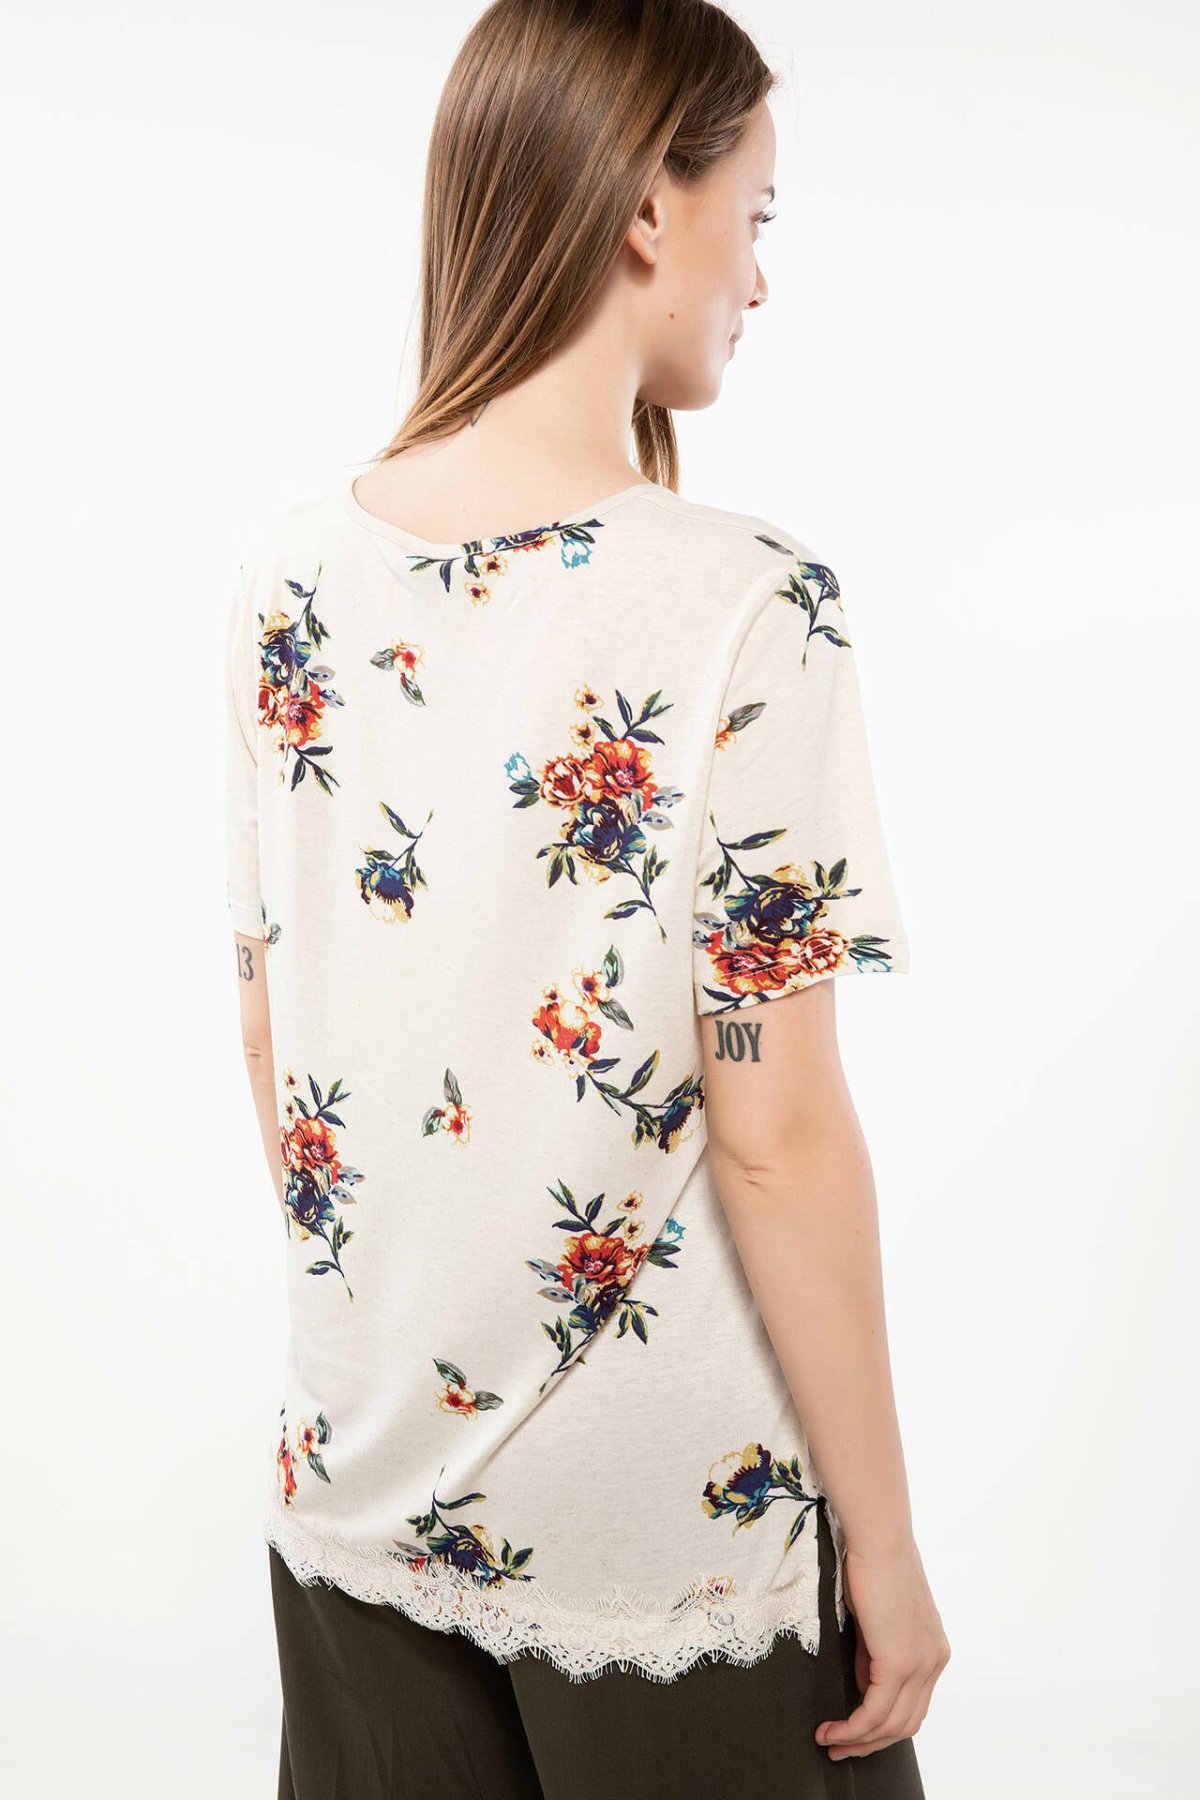 DeFacto Zomer Vrouw Mode Korte Mouw Lady O-hals Casual T-Shirt Vrouwelijke Harajuku Losse Print Tops Nieuwe-J7787AZ18HS